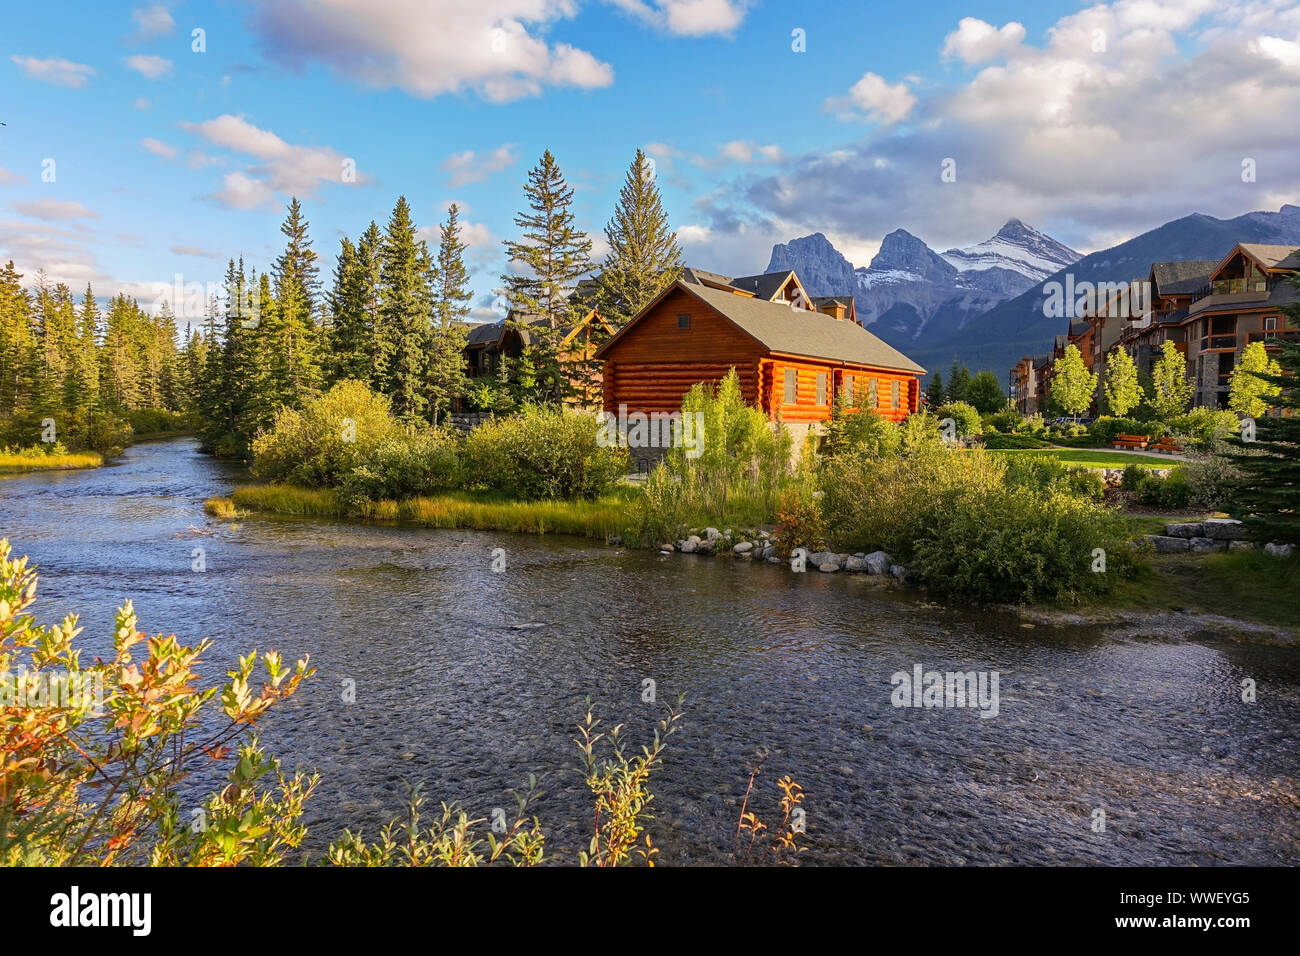 spring-creek-alpine-village-landscape-an